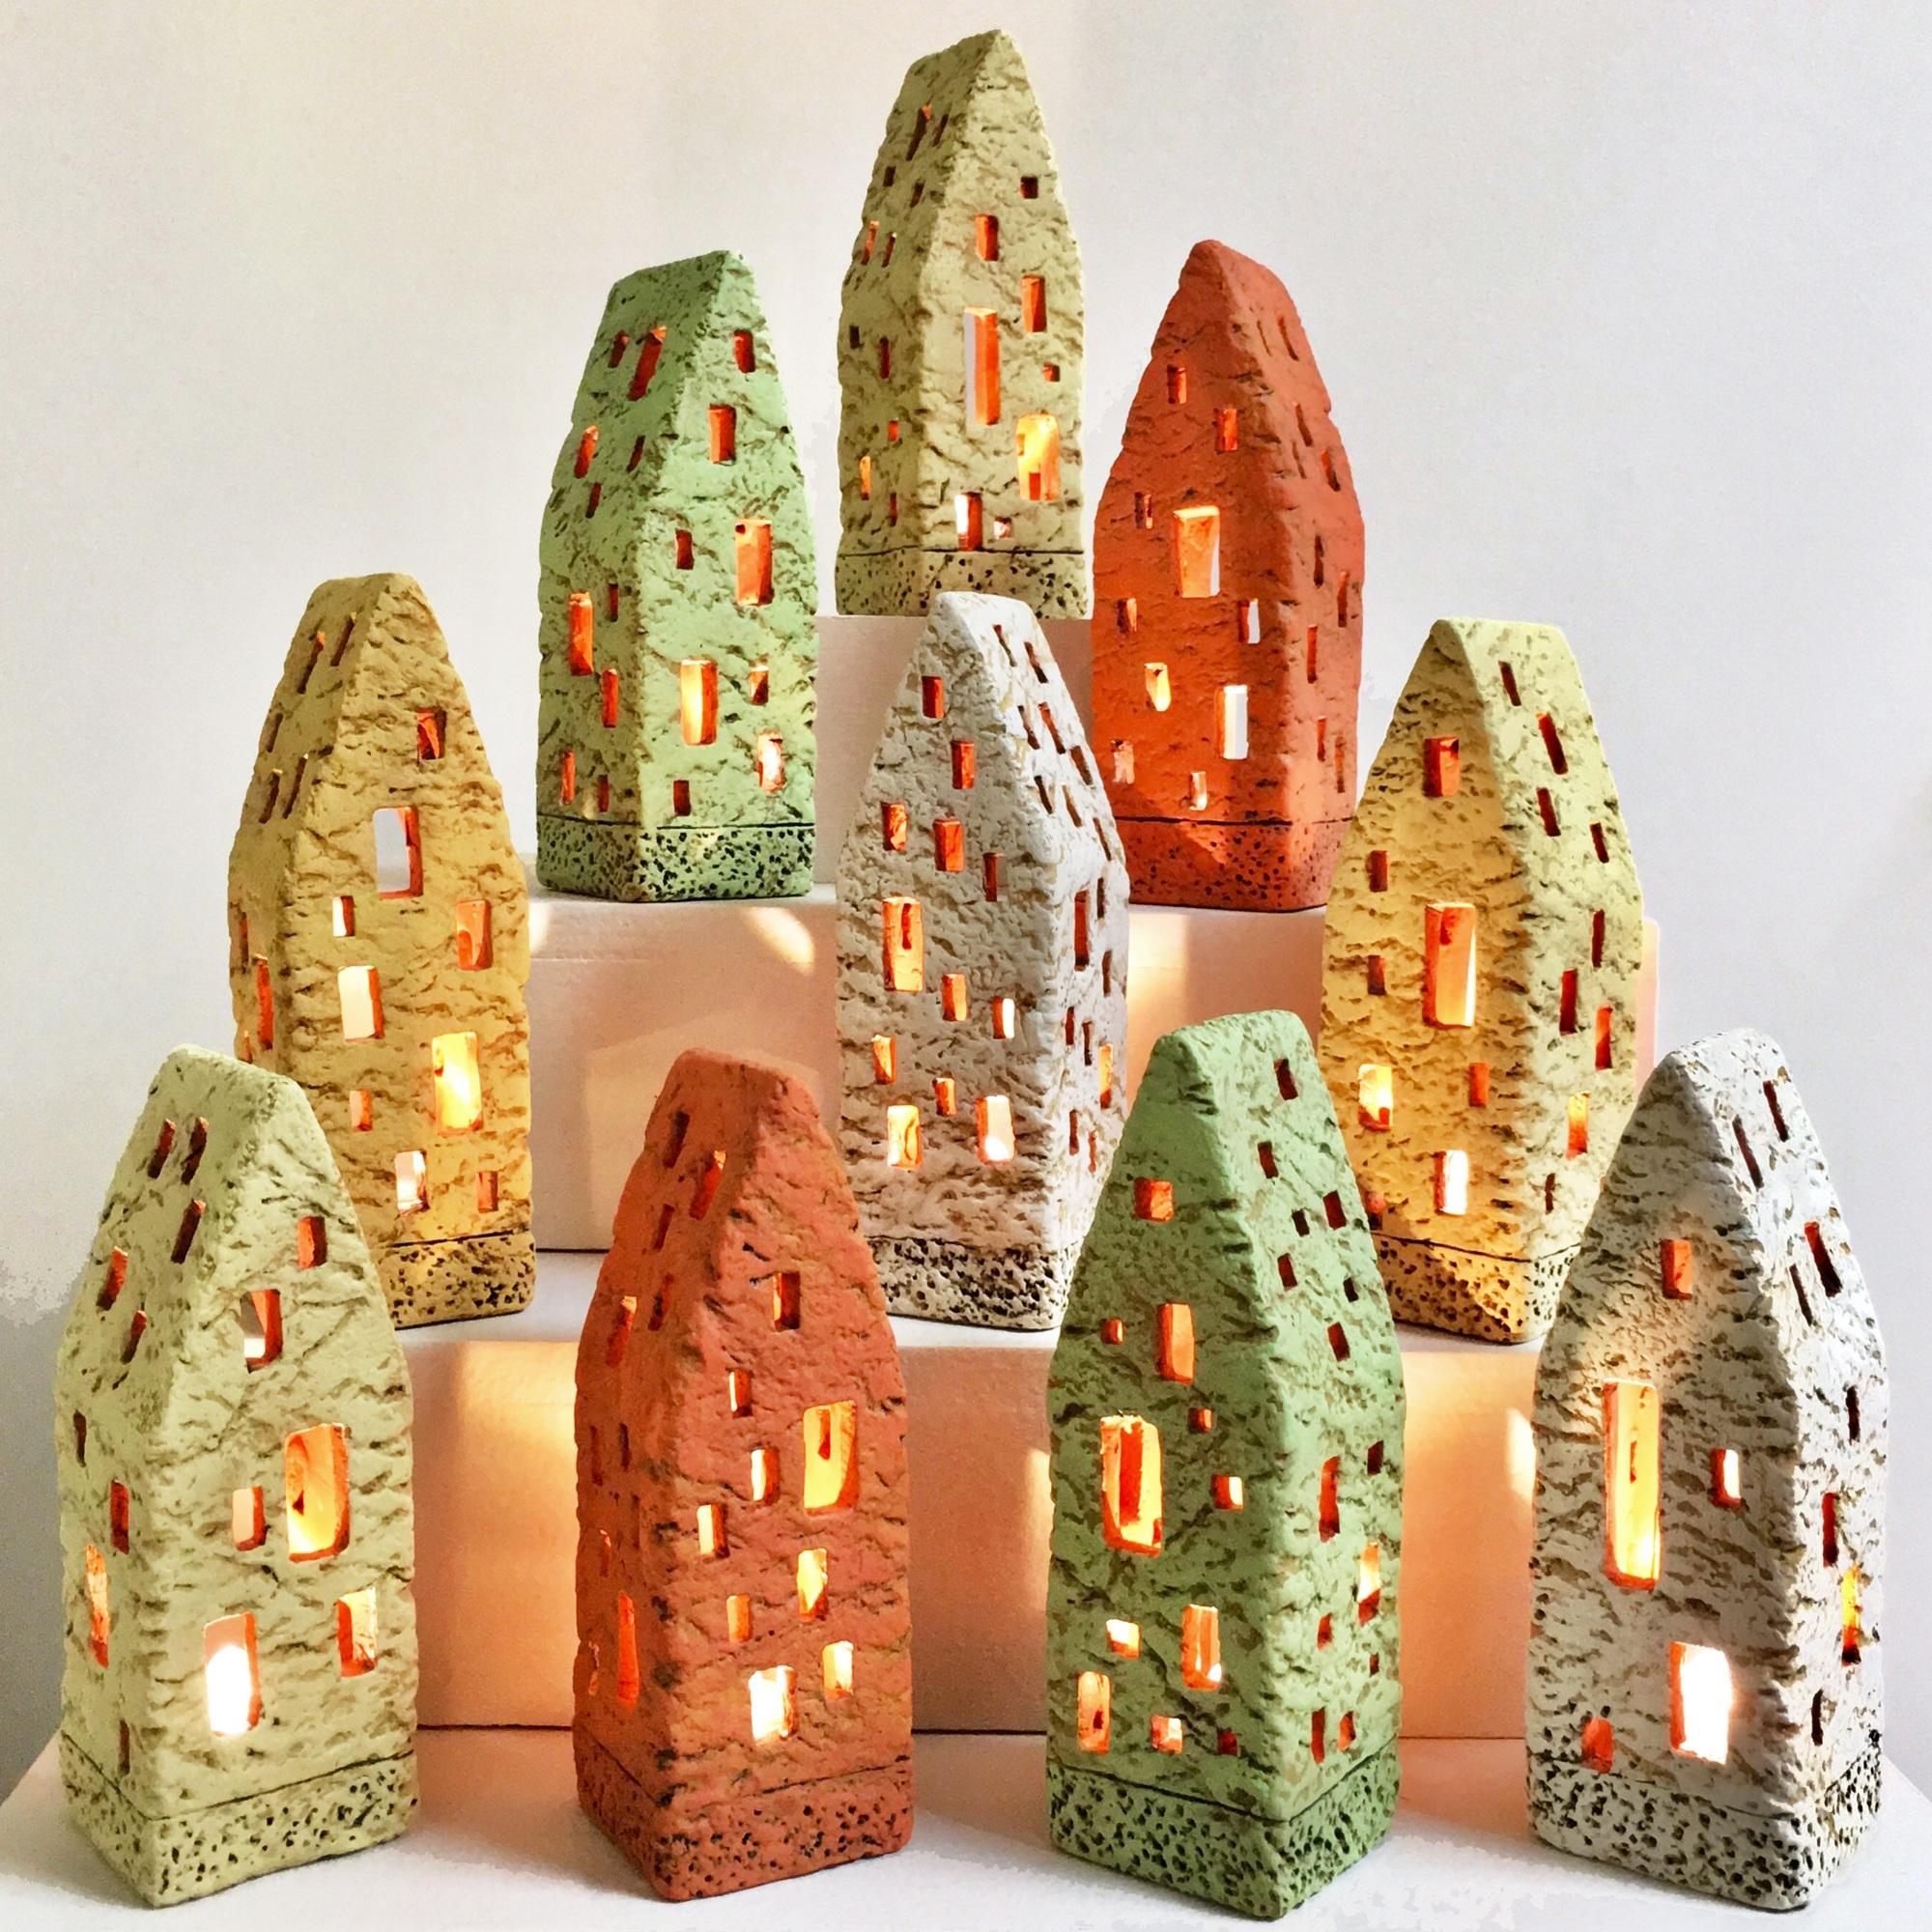 10+Houses+of+Light+-+Byers+McCurry+Studio.jpg